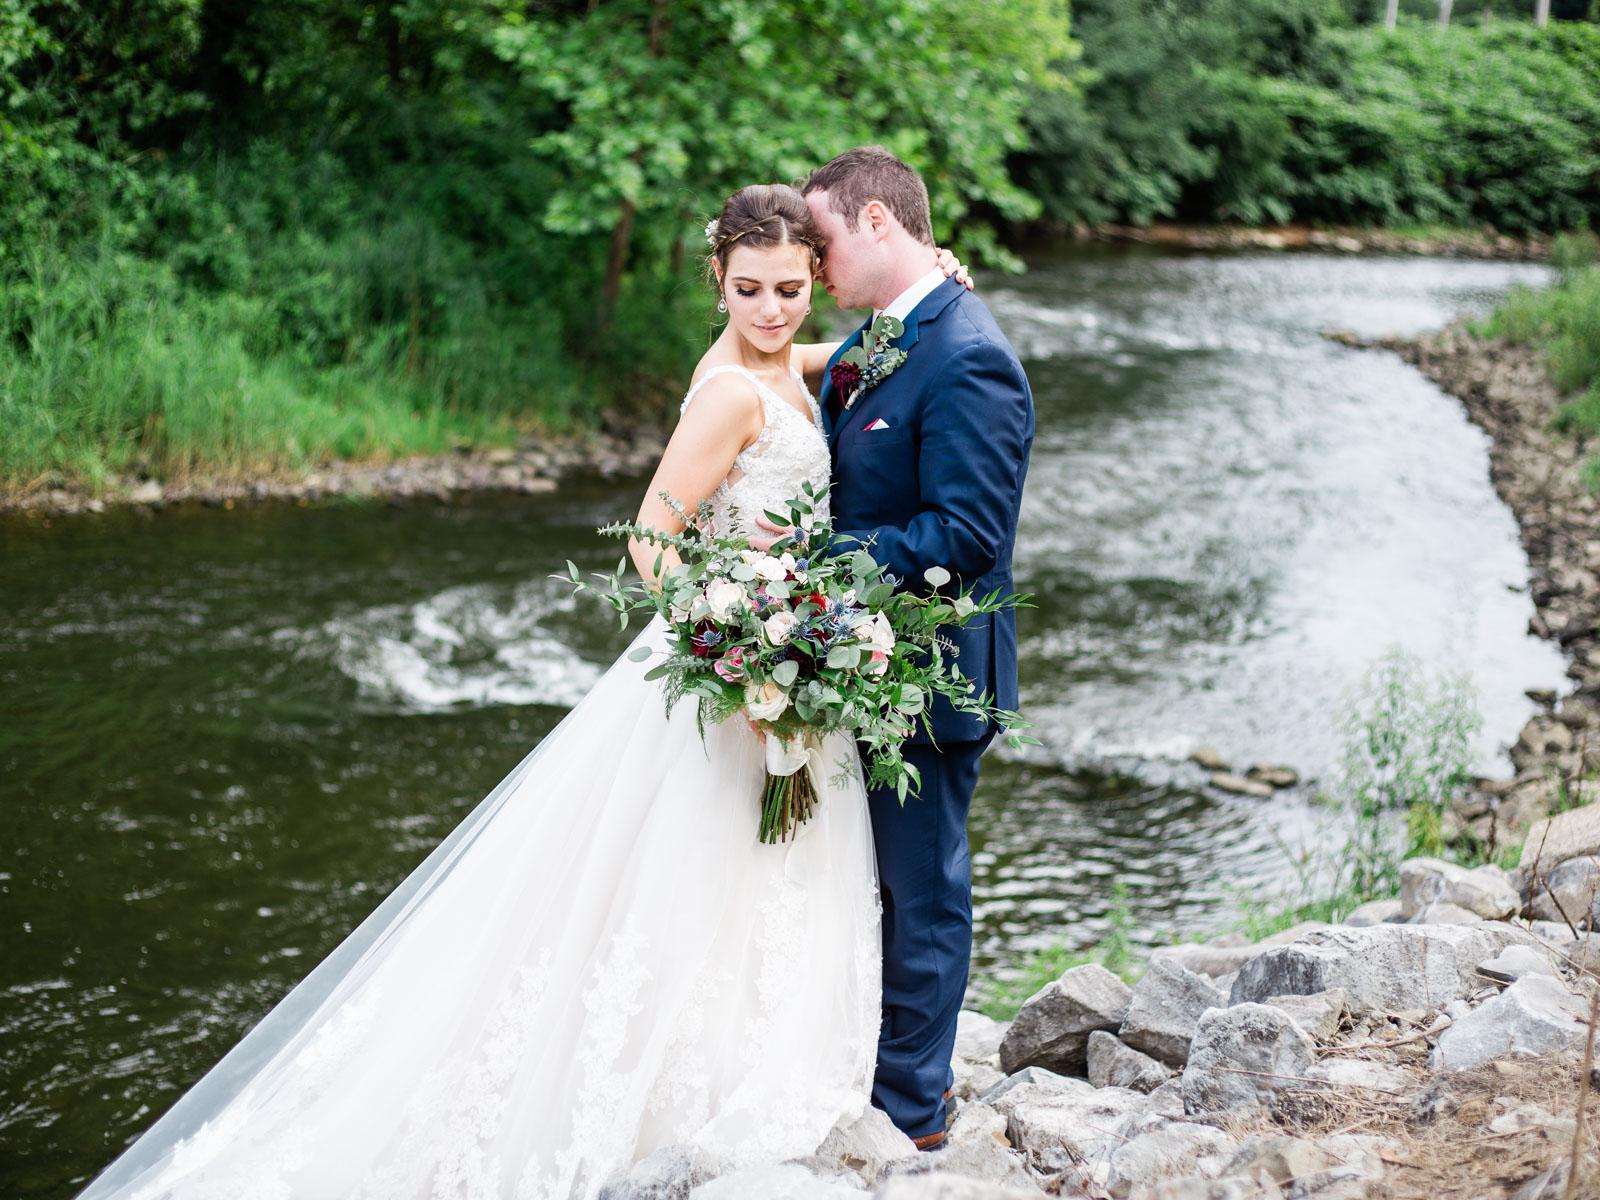 bohemian-akron-wedding-by-matt-erickson-photography-15.jpg